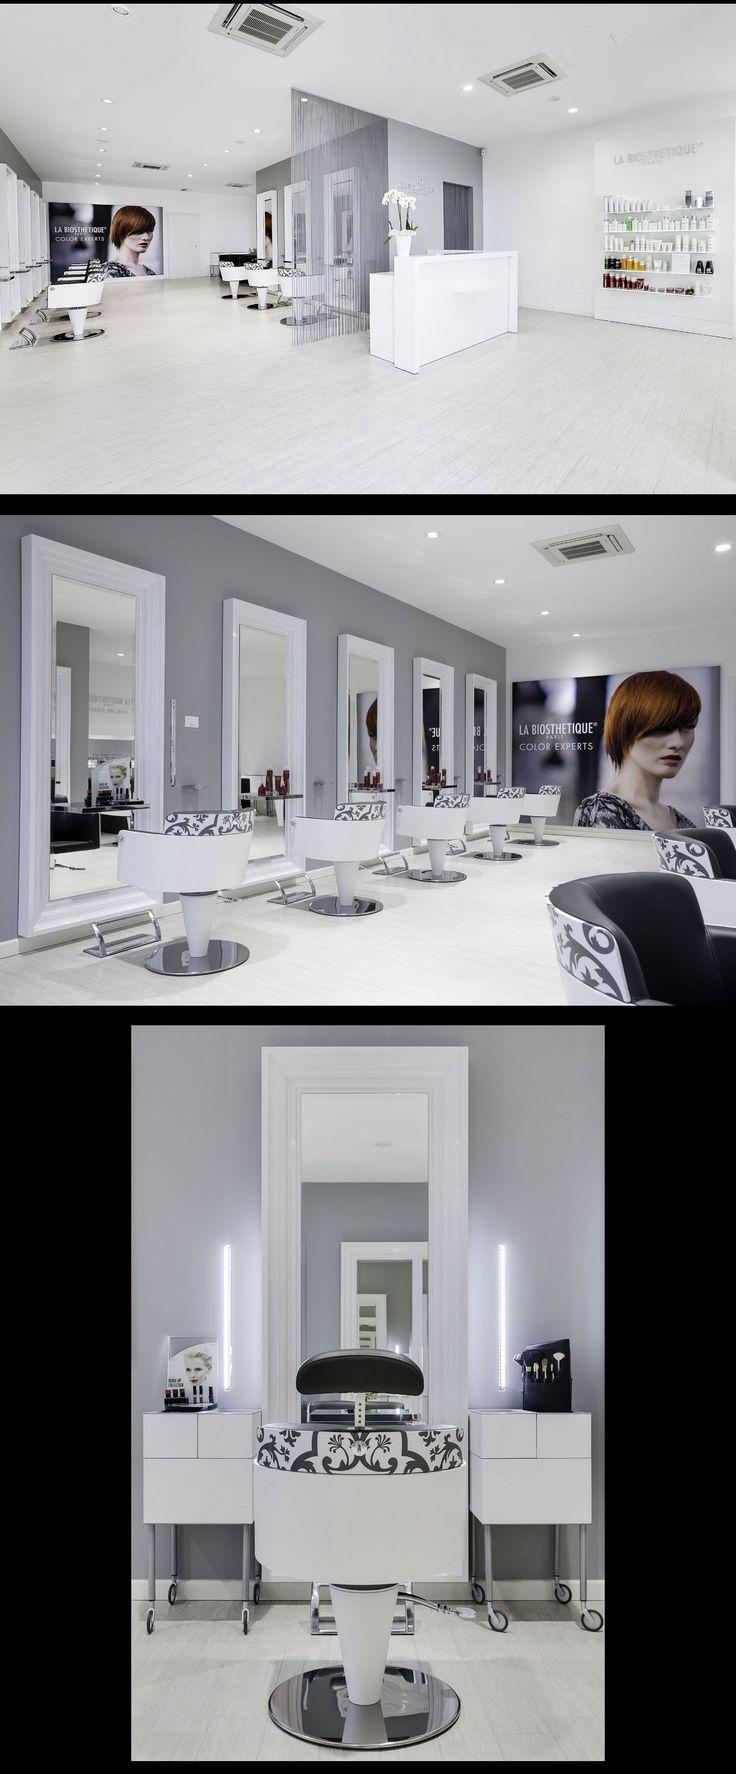 Hair Salon Capolavoro - Mantova (Italy) - Salon Design by Mauro Cimarosti - #SalonTrends